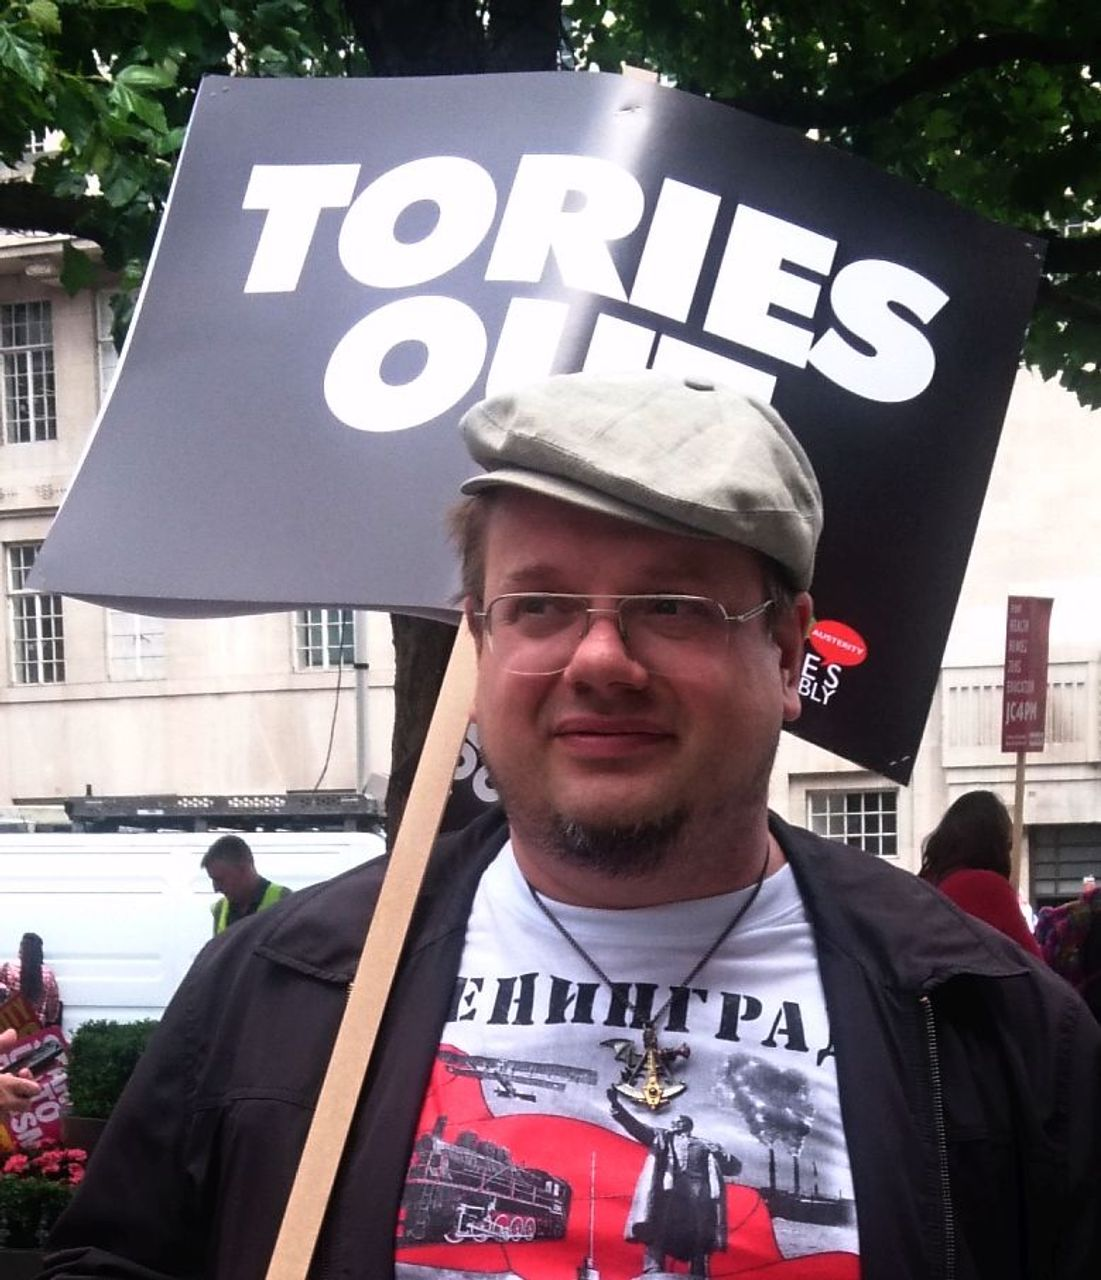 Andrew, London 1 July anti-Theresa May demonstrator